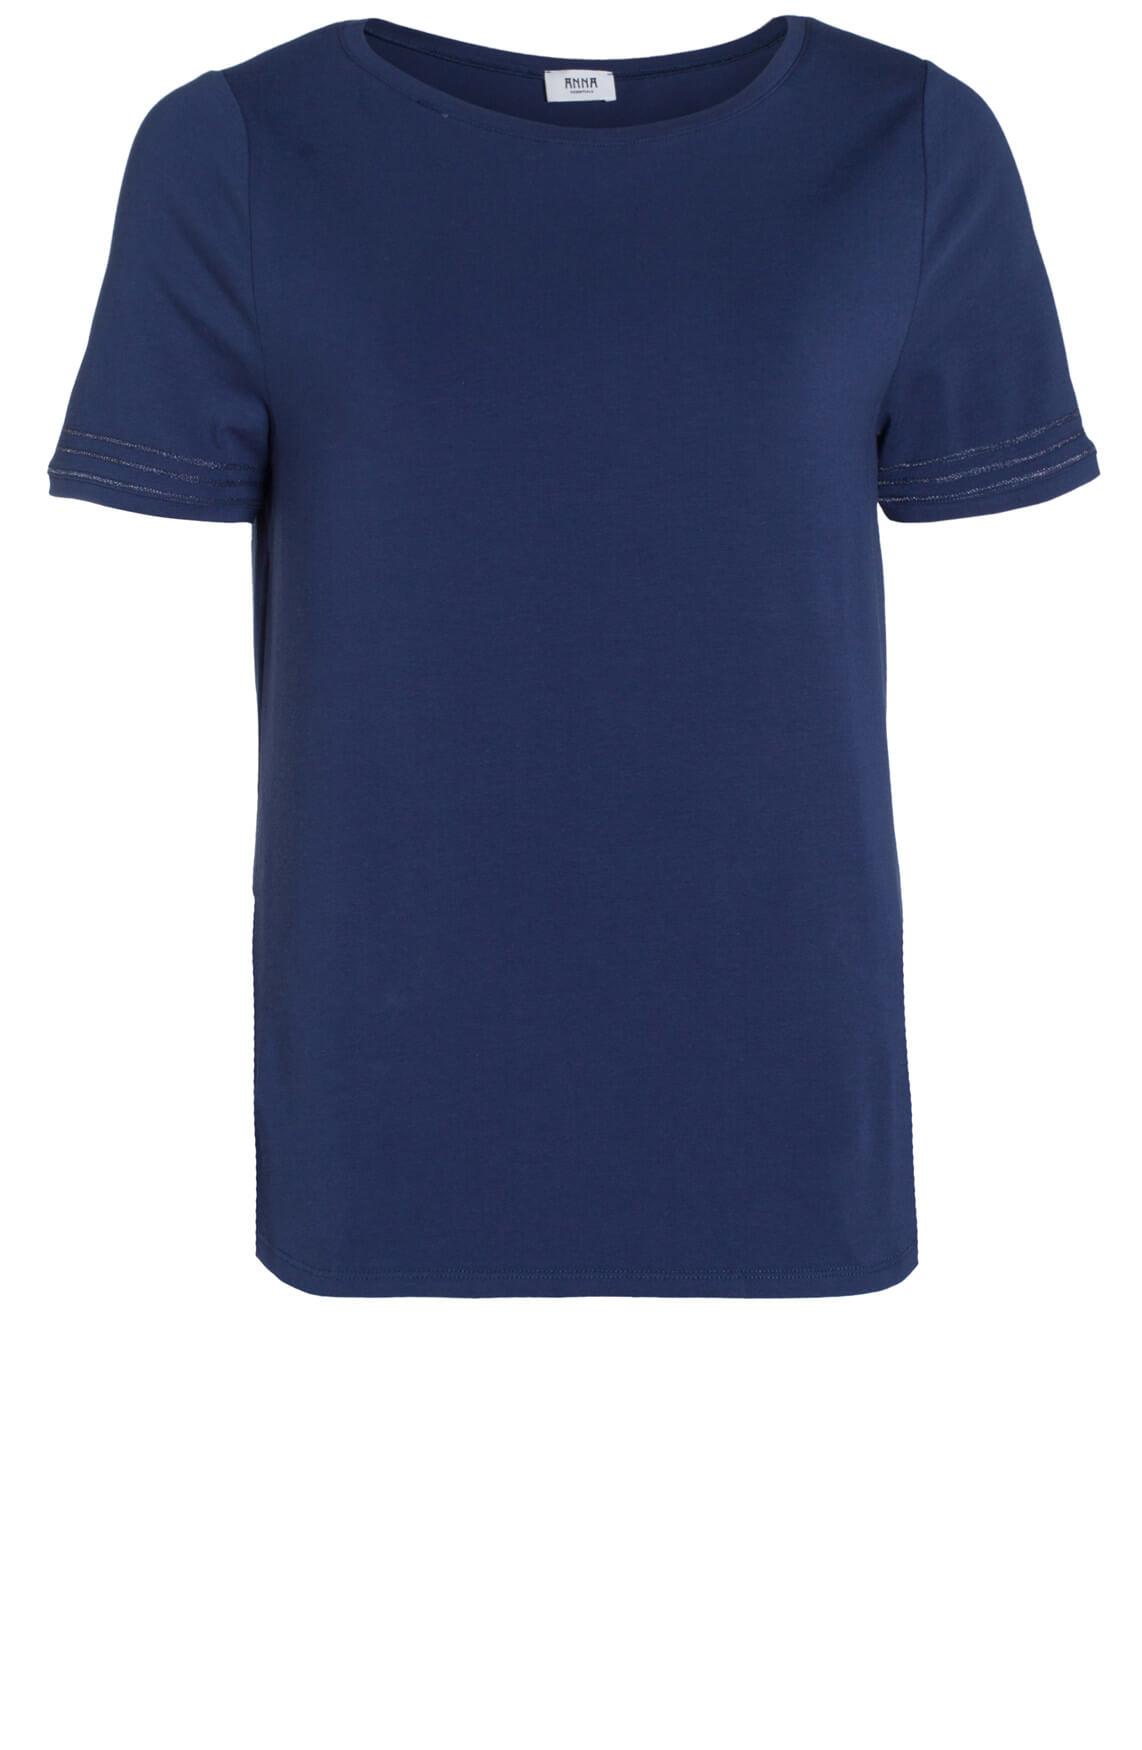 Anna Dames Basic shirt blauw Blauw